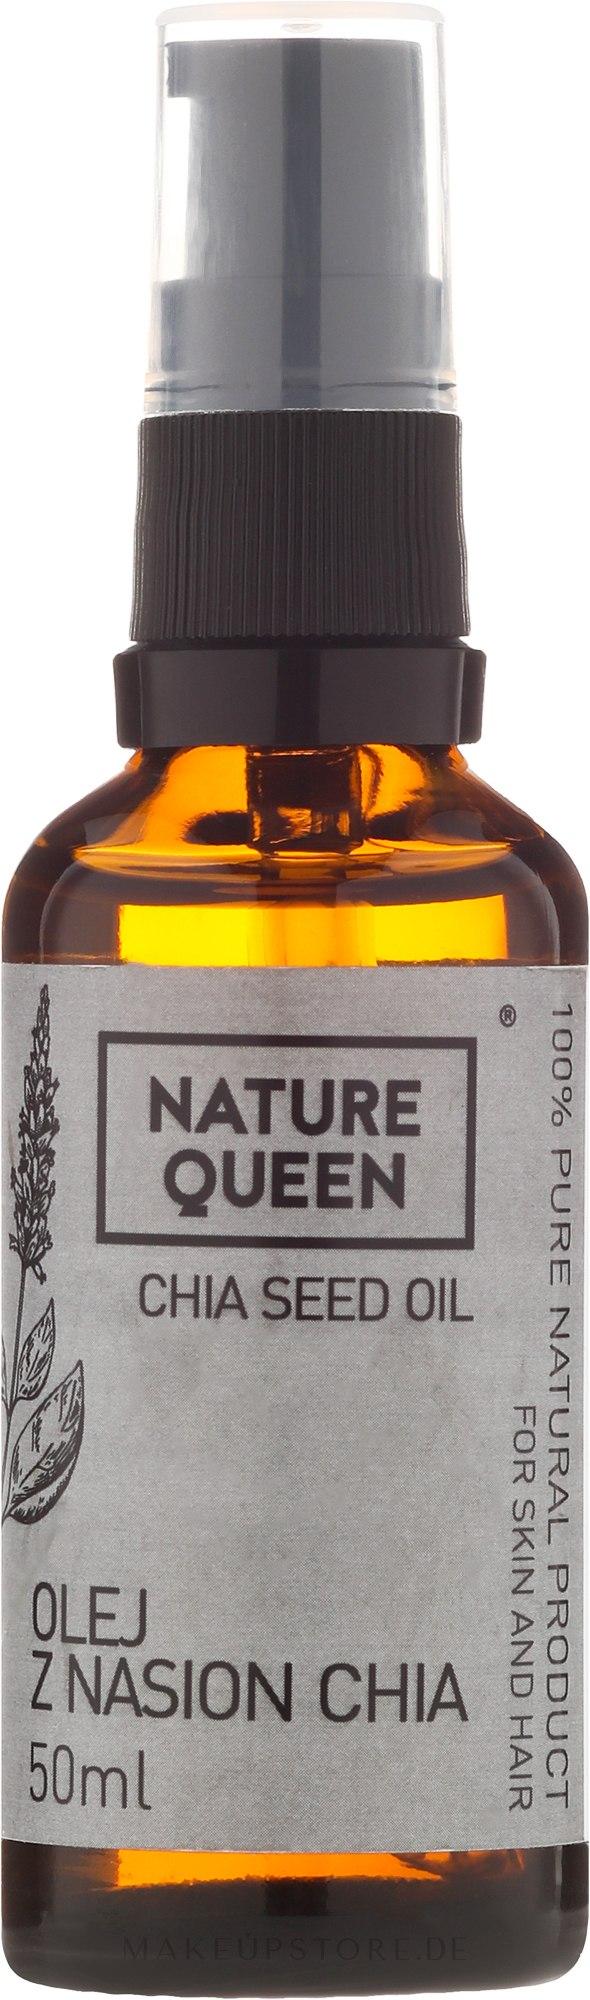 Chiasamenöl - Nature Queen Chia Seed Oil — Bild 50 ml